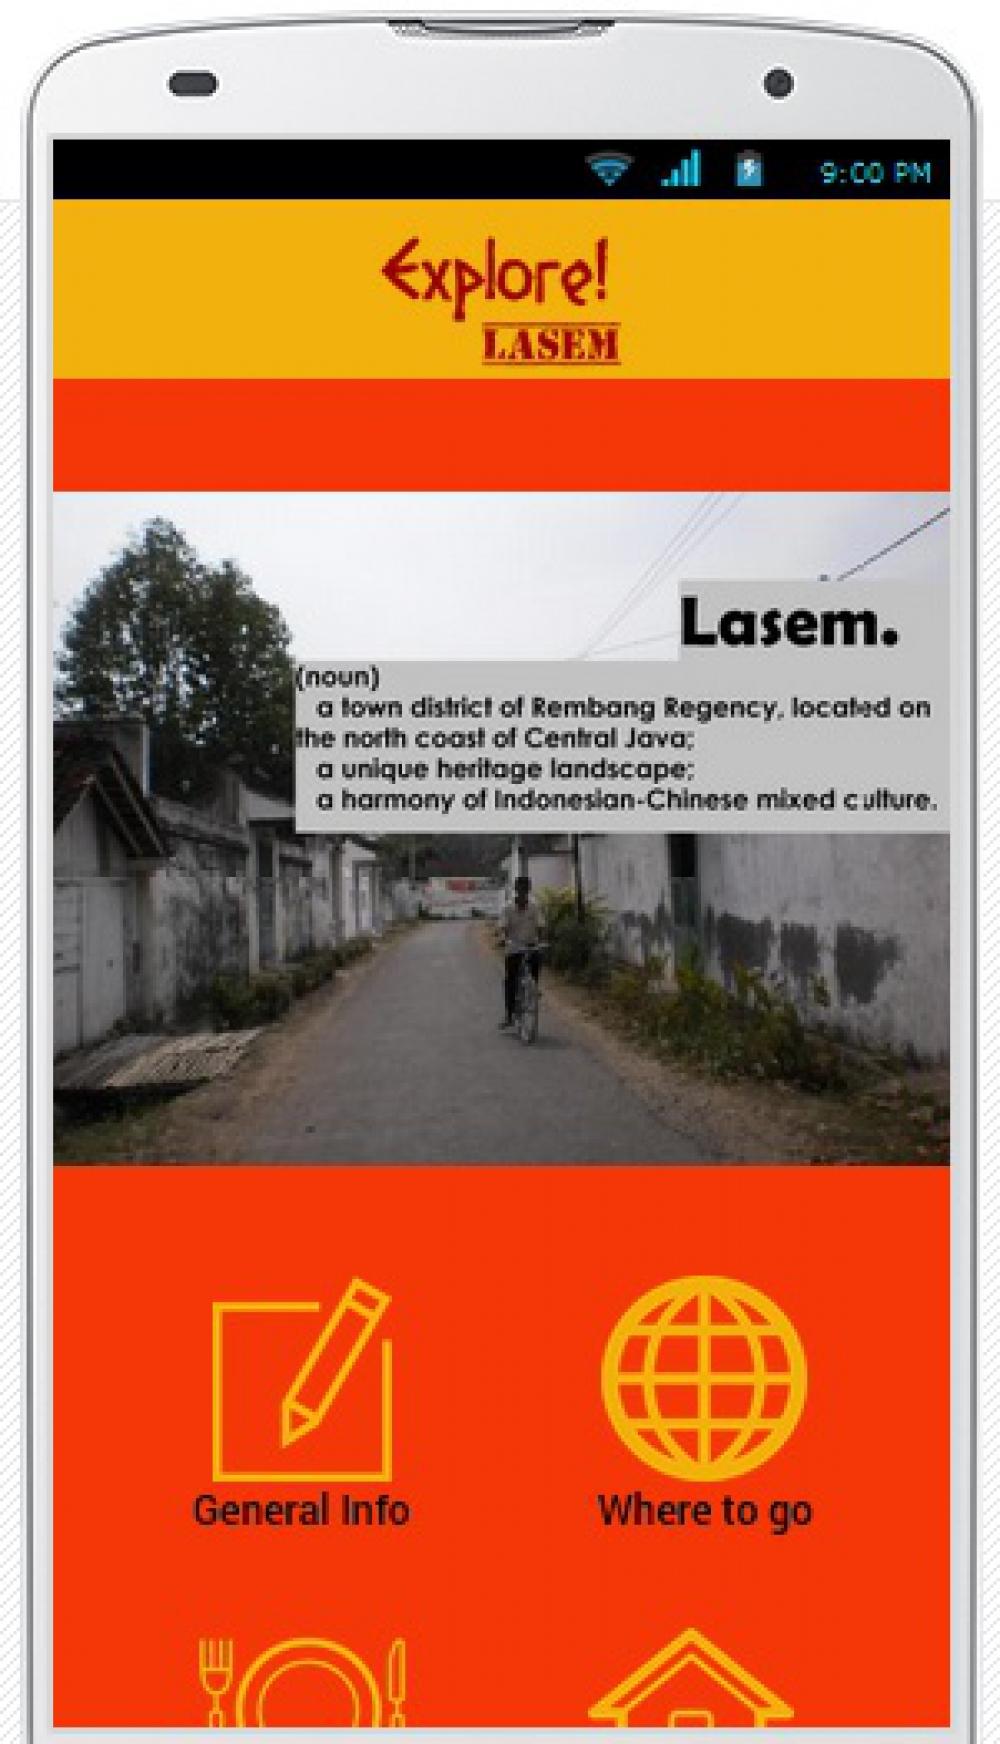 Aplikasi Ponsel untuk Wisata di Pecinan Lasem, Jawa Tengah